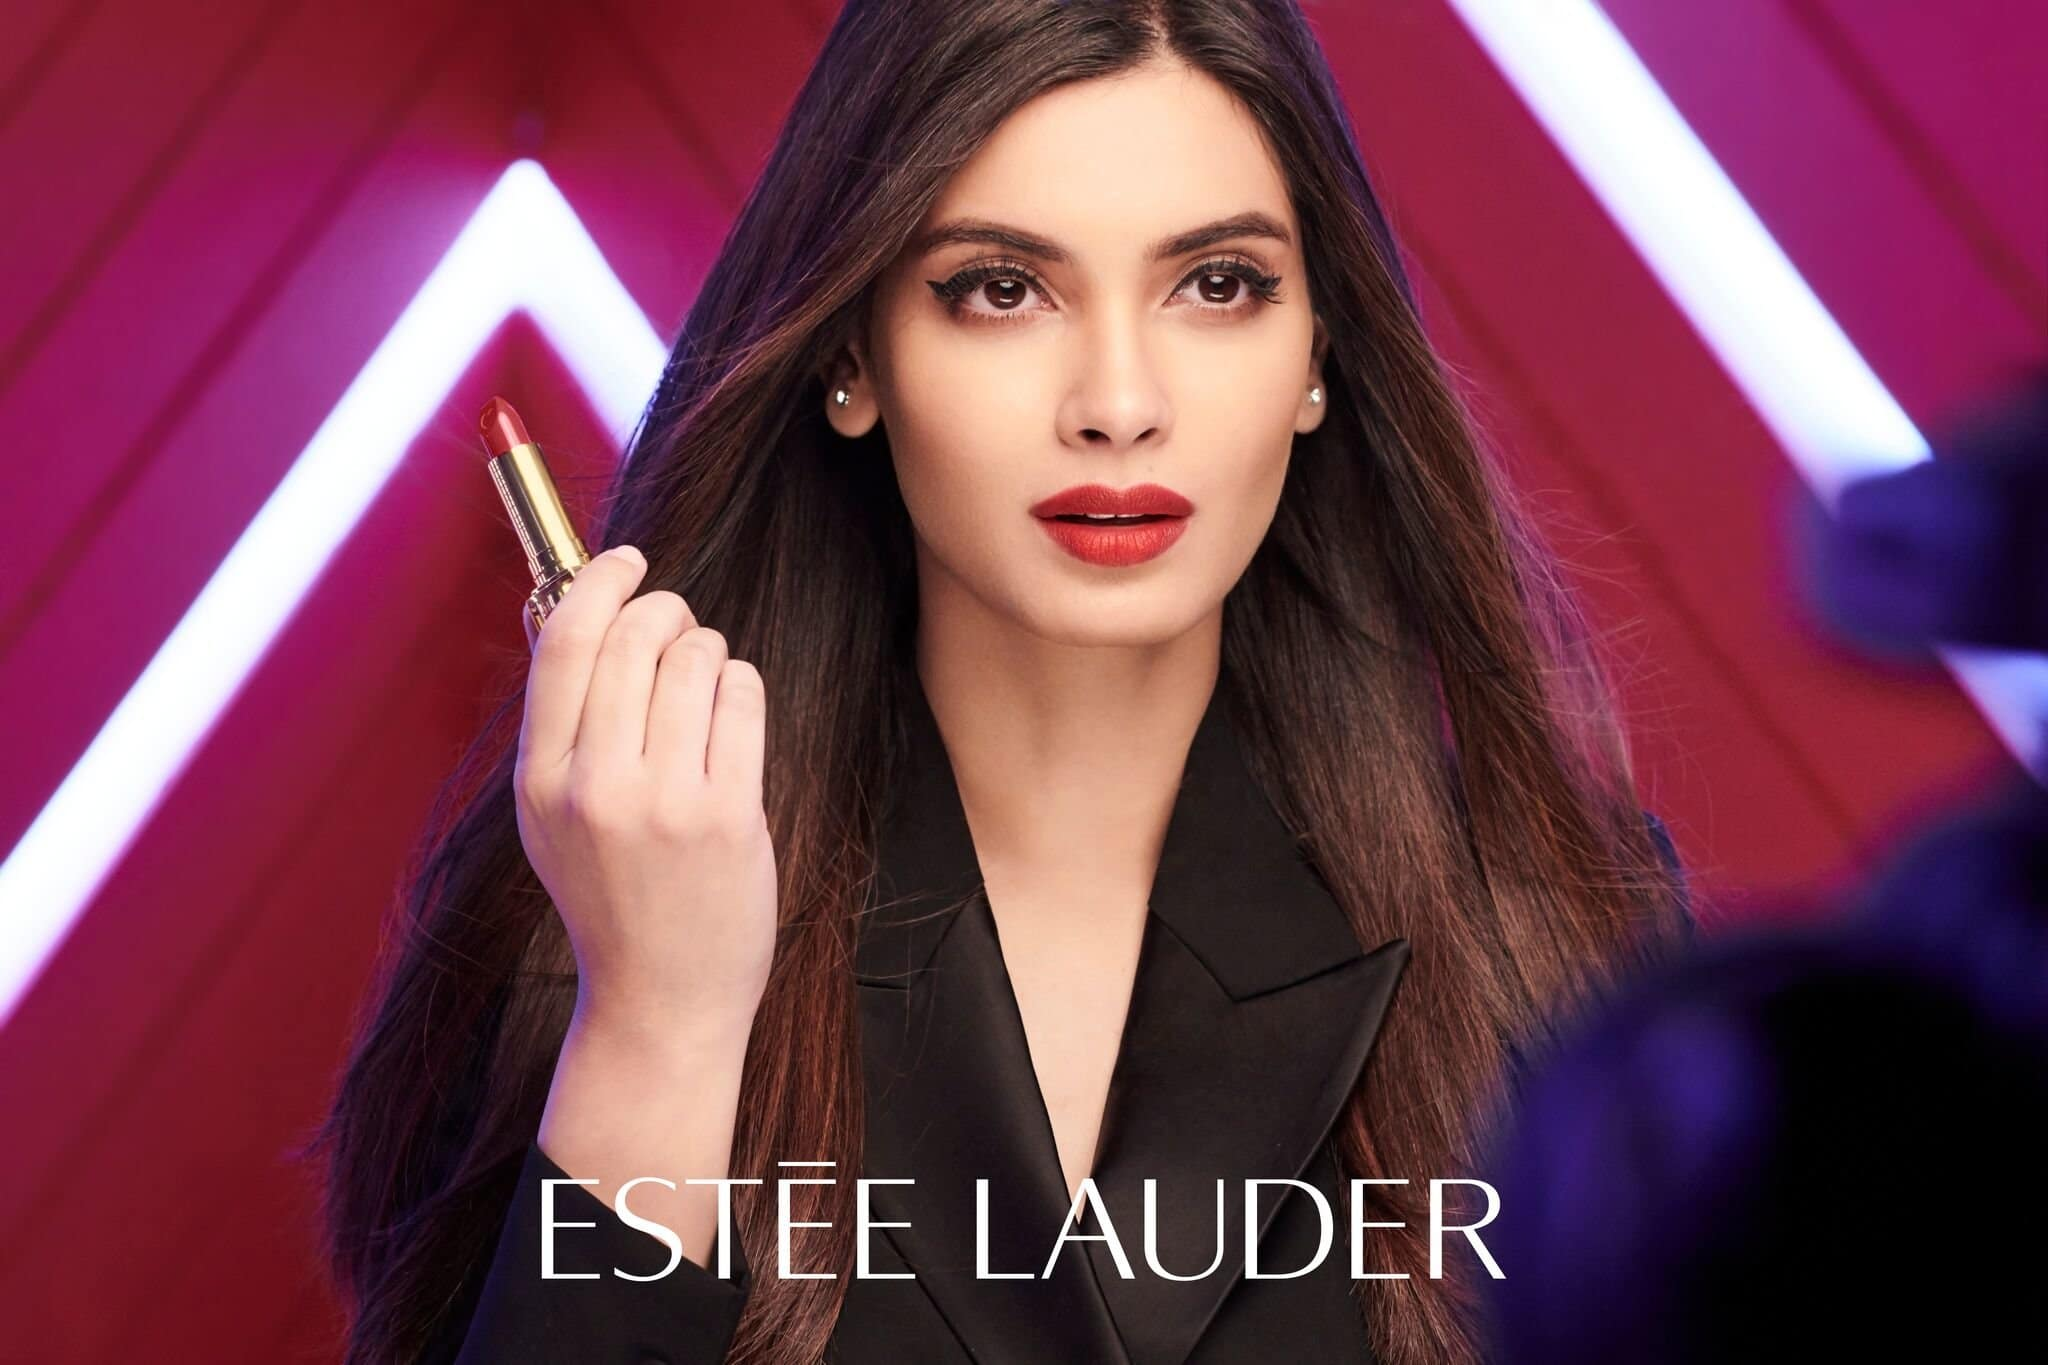 Estée Lauder has appointed Diana Penty as India's first brand ambassador